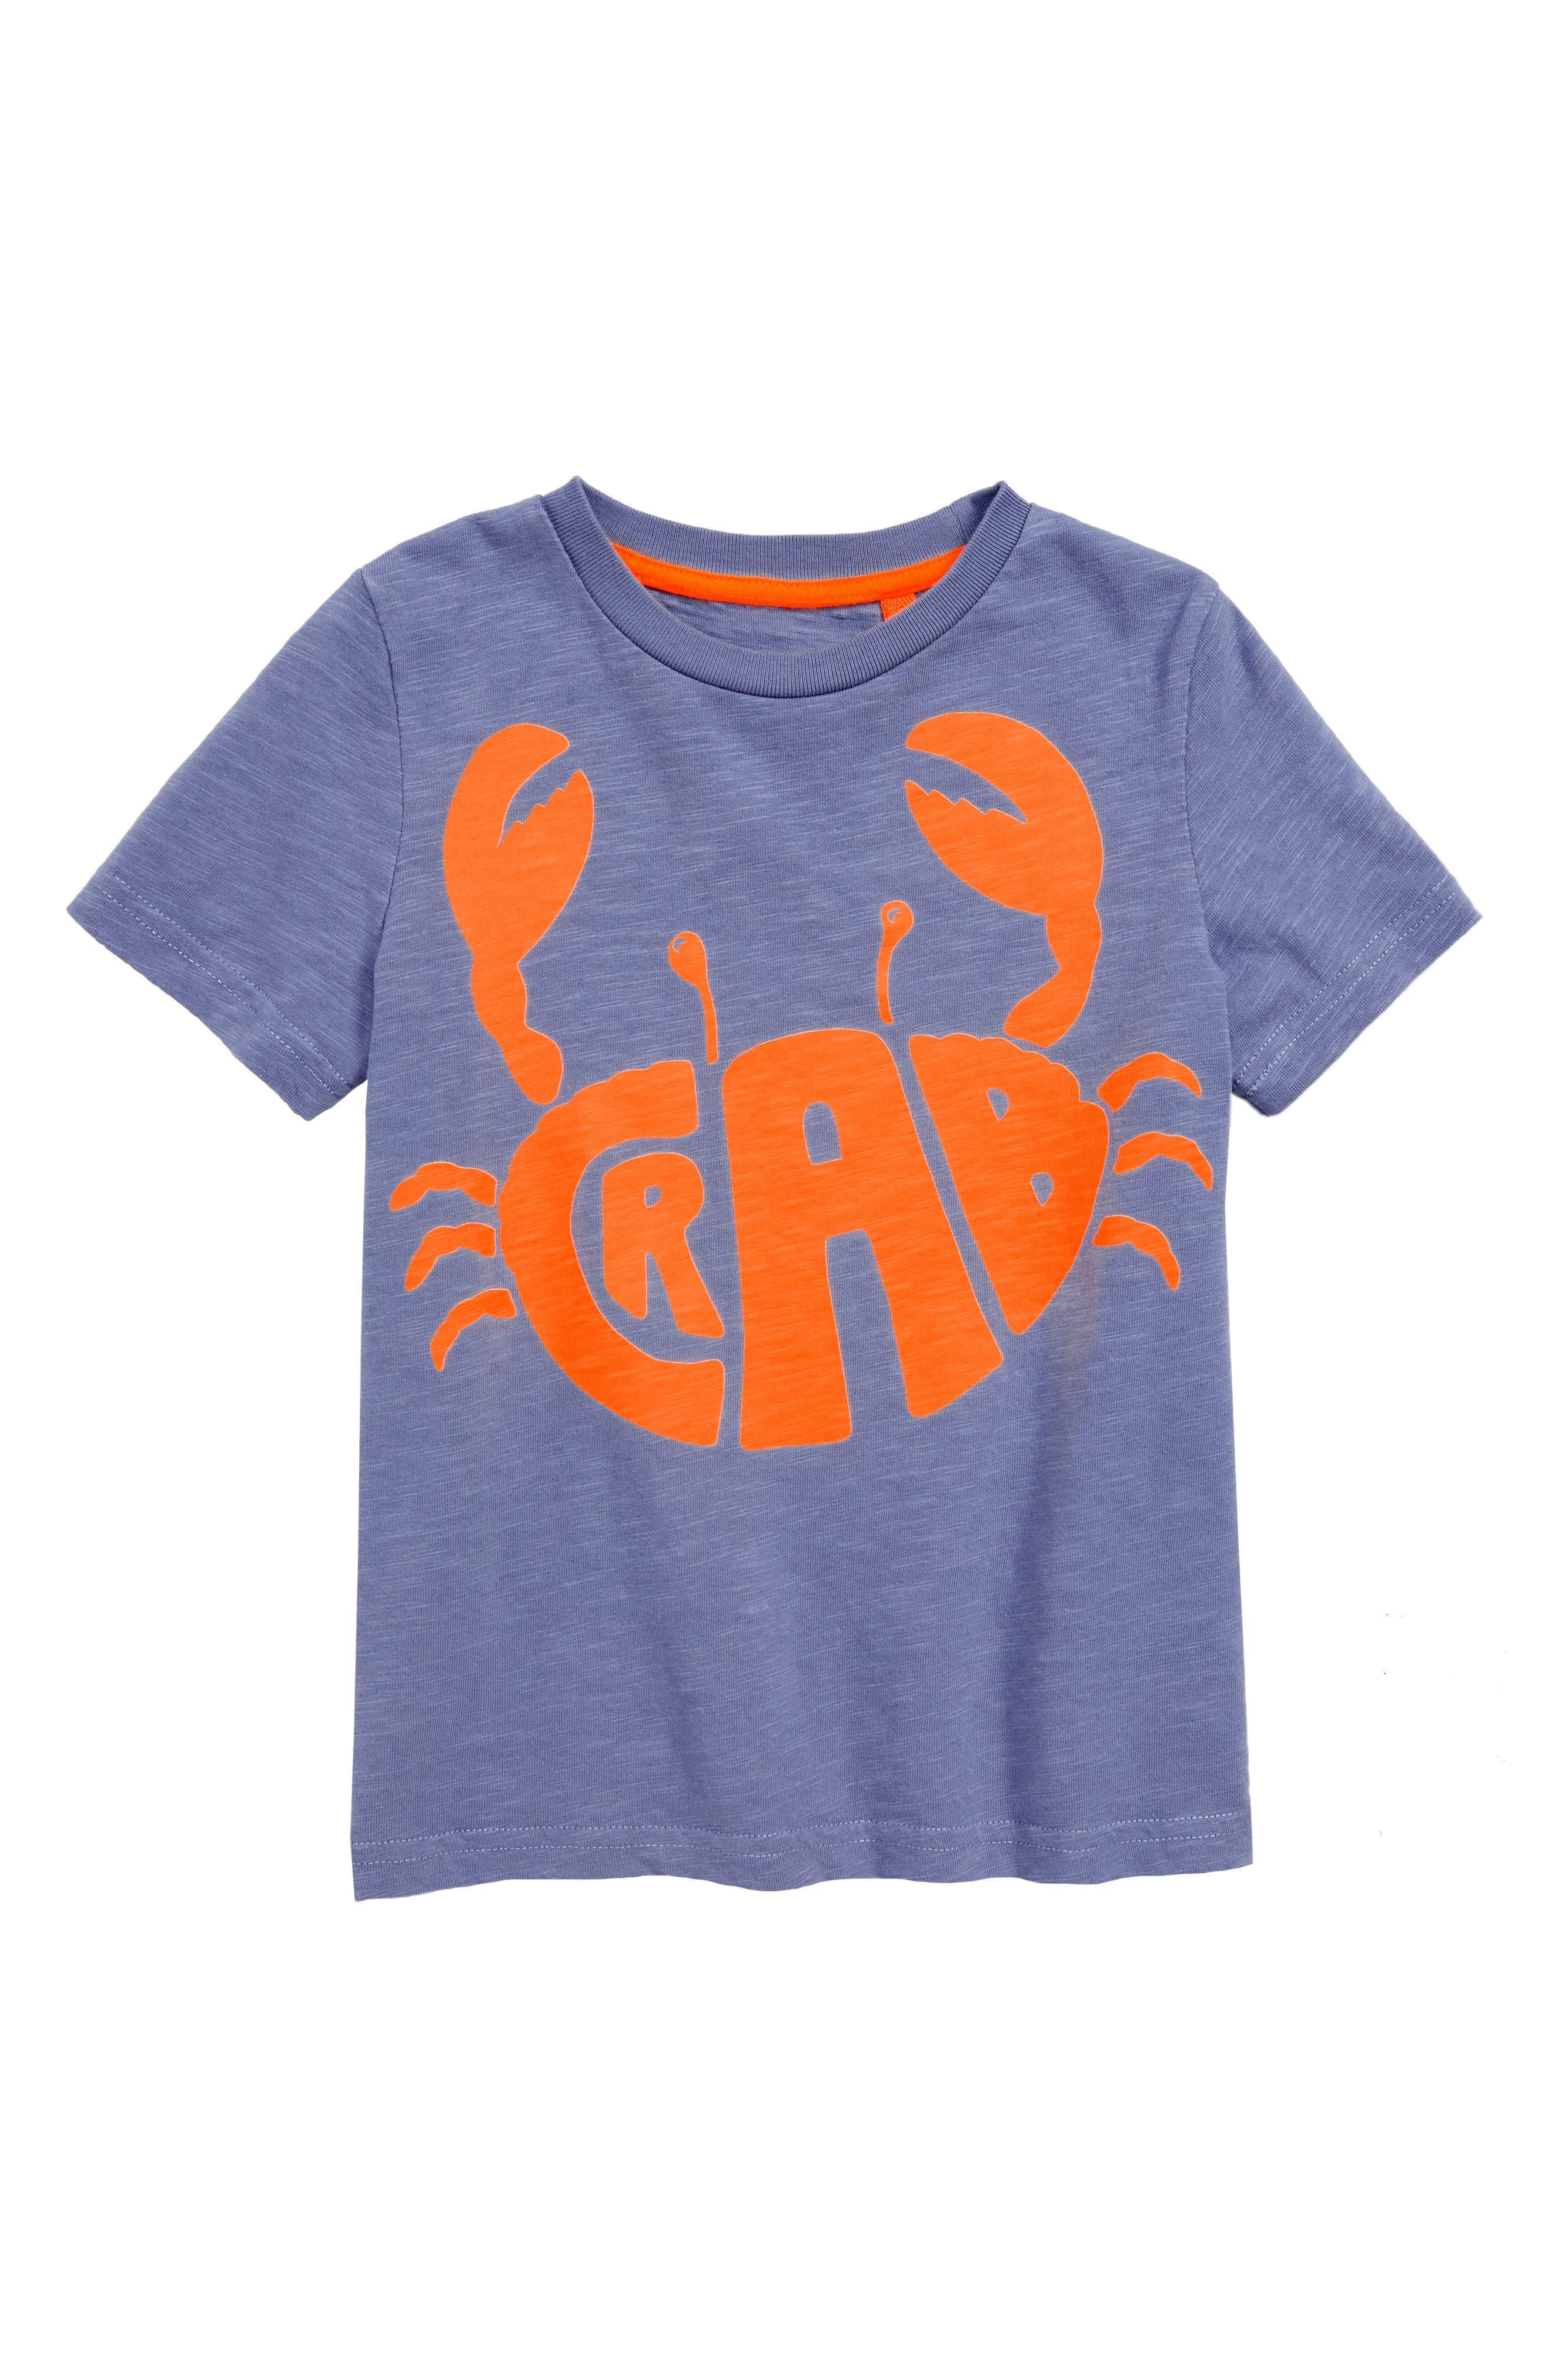 Fluoro Crab T-Shirt,                         Main,                         color, Hook Blue Crab